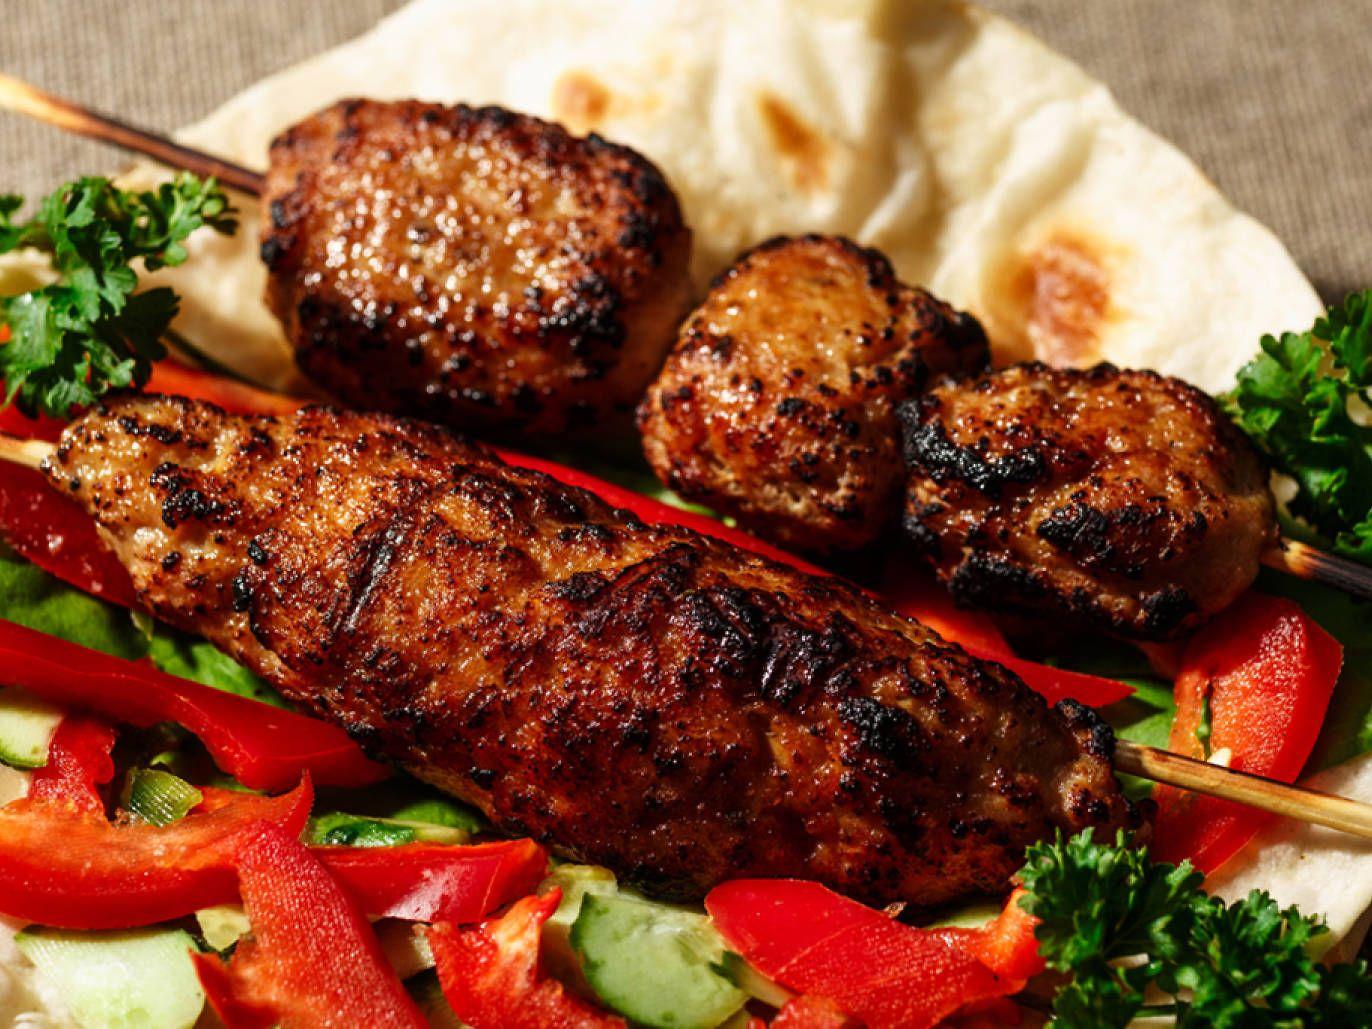 The Best Halal Restaurants In Nyc Halal Recipes Nyc Food Nyc Restaurants